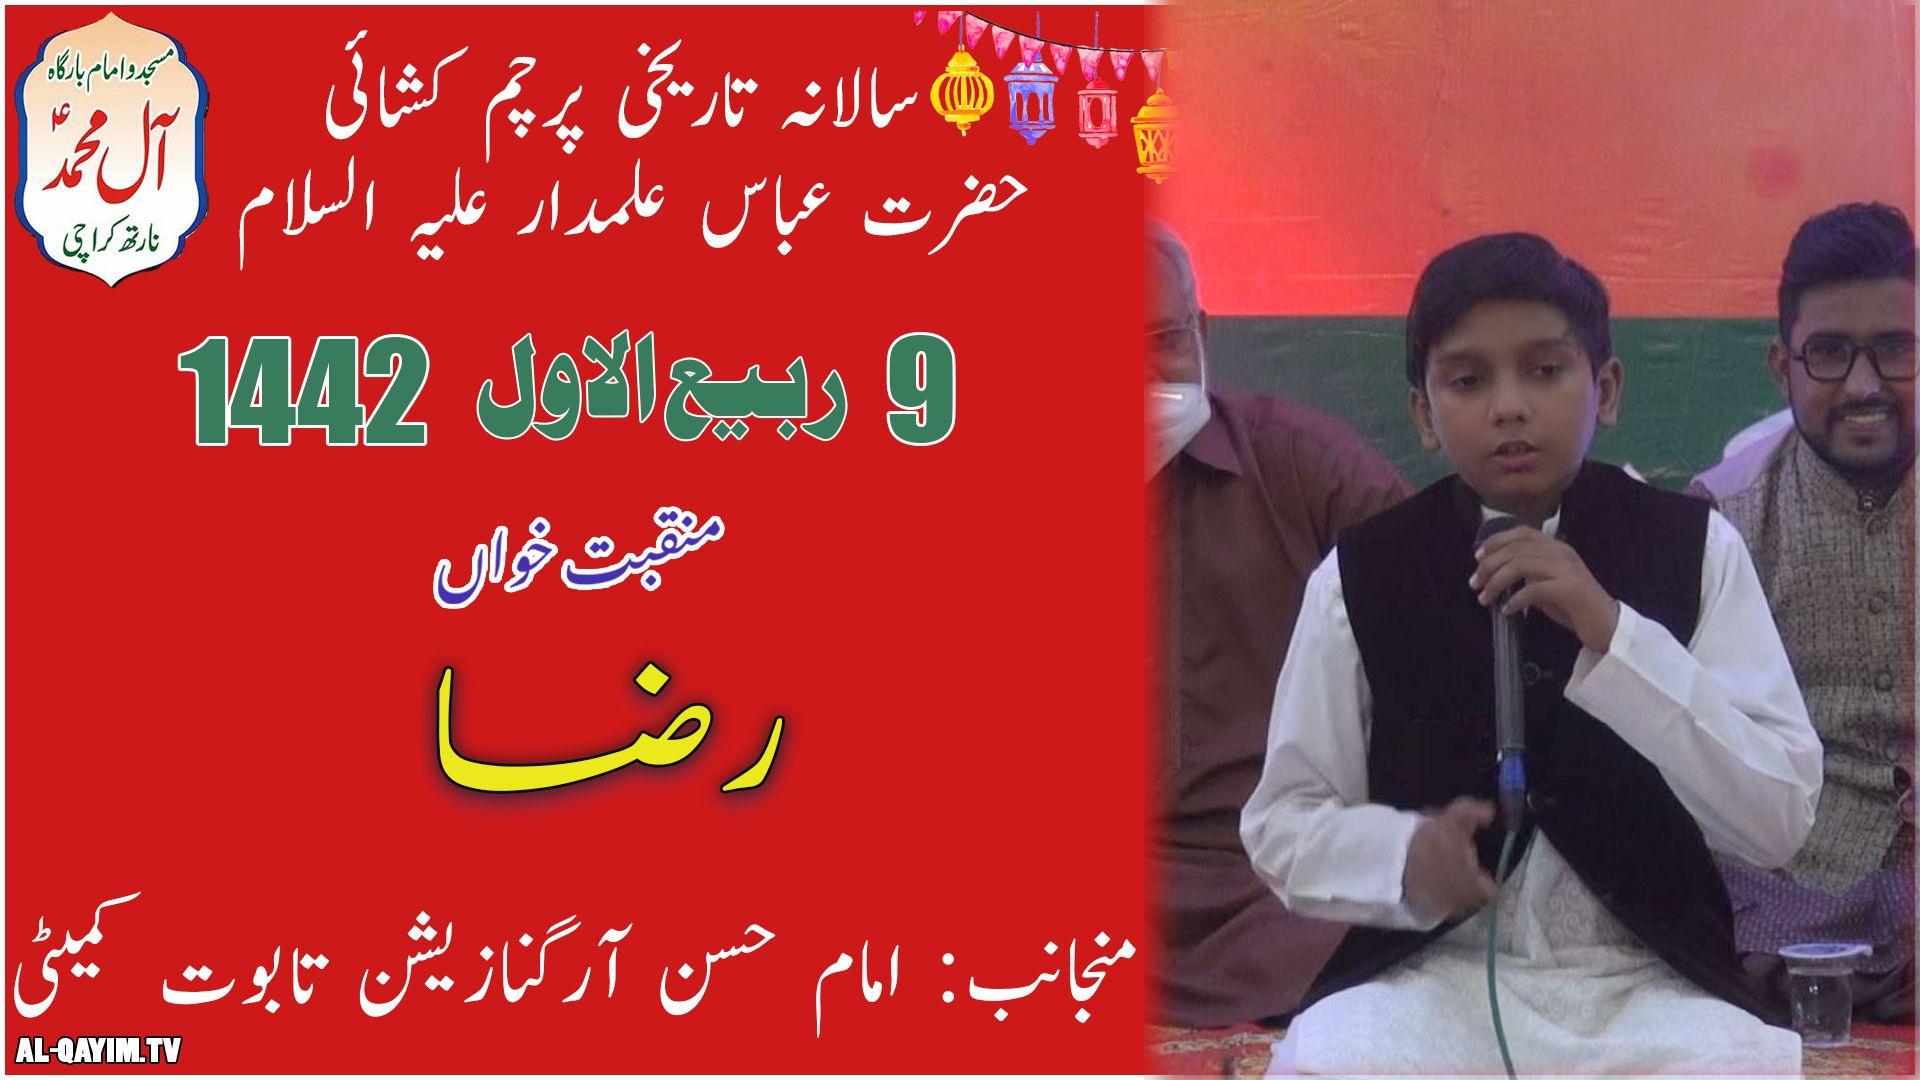 Manqabat | Raza | Eid-e-Zehra - 9th Rabi-ul-Awal 1442/2020 - Imam Bargah AleyMohammed - Karachi